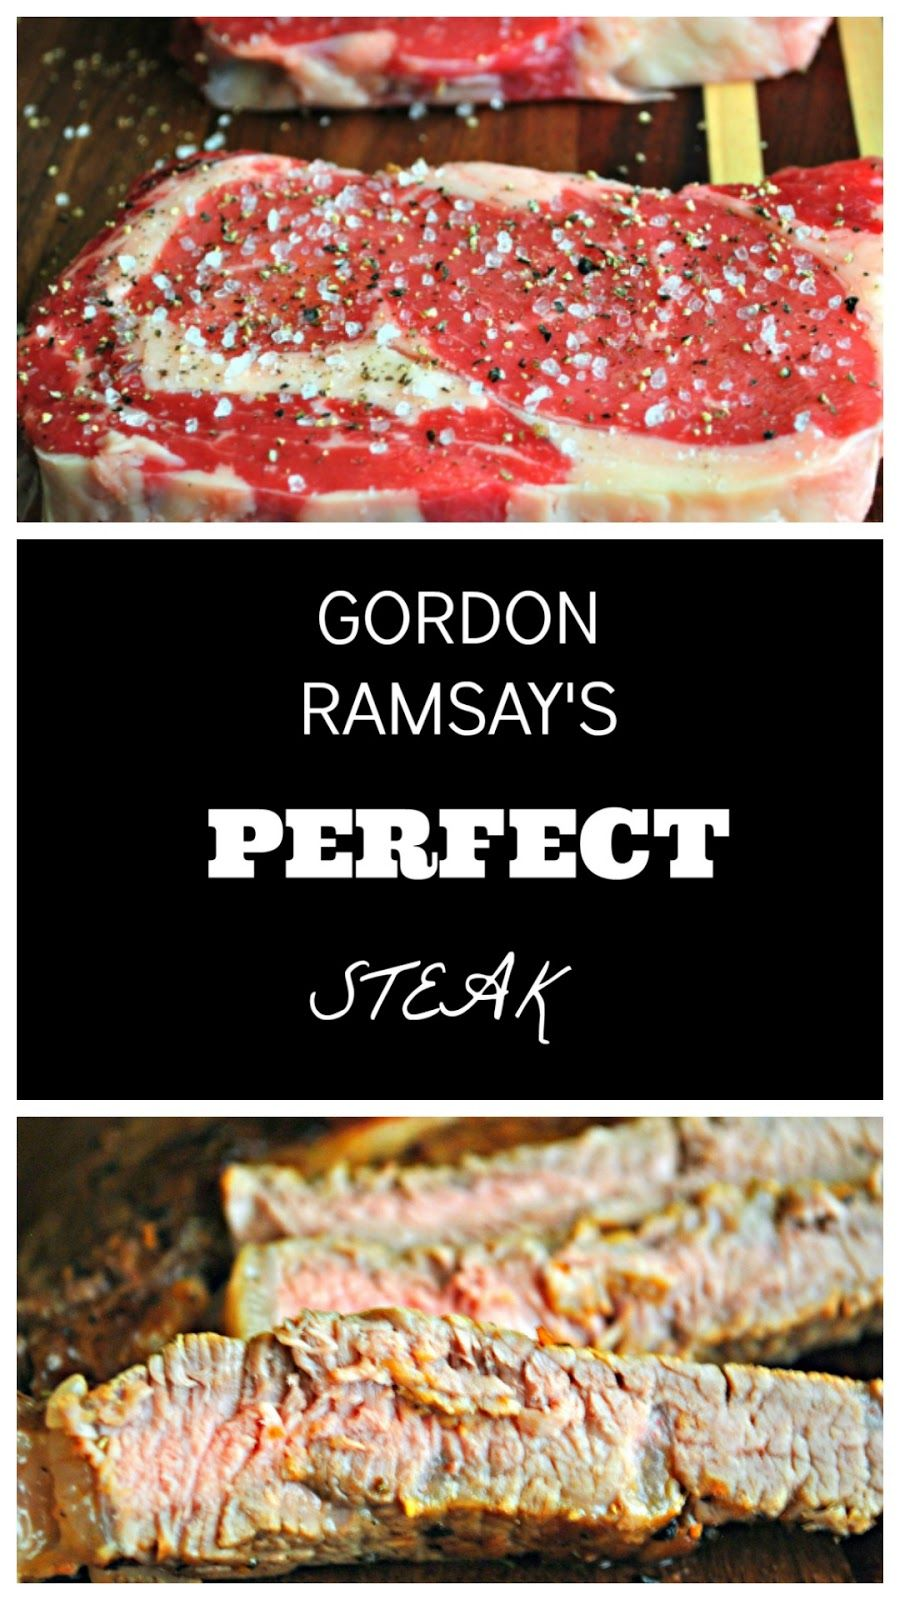 Gordon Ramsay S Perfect Steak Keat S Eats Recipe Gordon Ramsey Recipes Gordon Ramsay Recipe Gordon Ramsay Steak